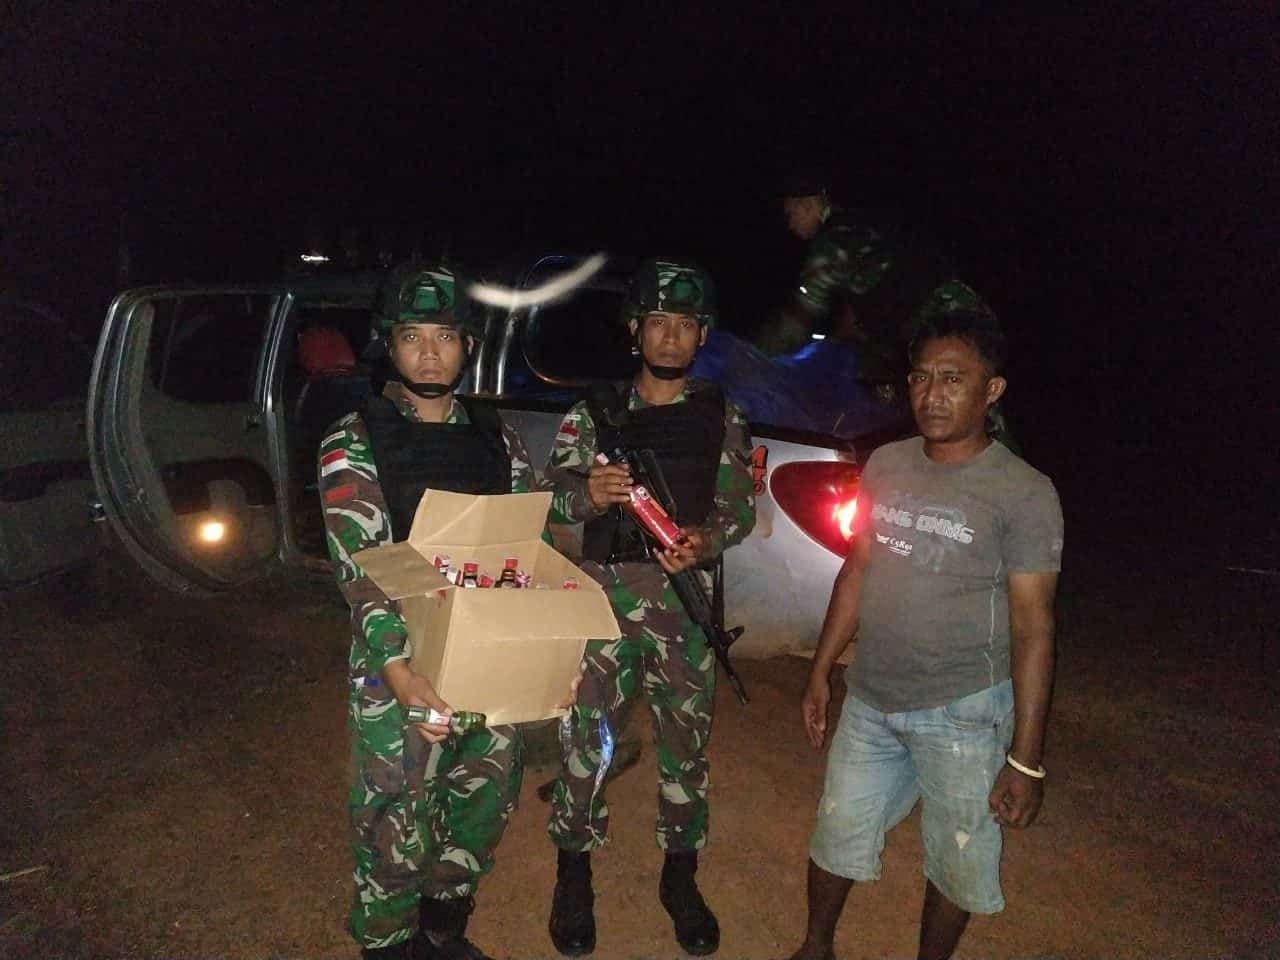 Bawa Ratusan Botol Miras, Sopir Taksi Diamankan Satgas Pamtas Yonif 411 di Sota